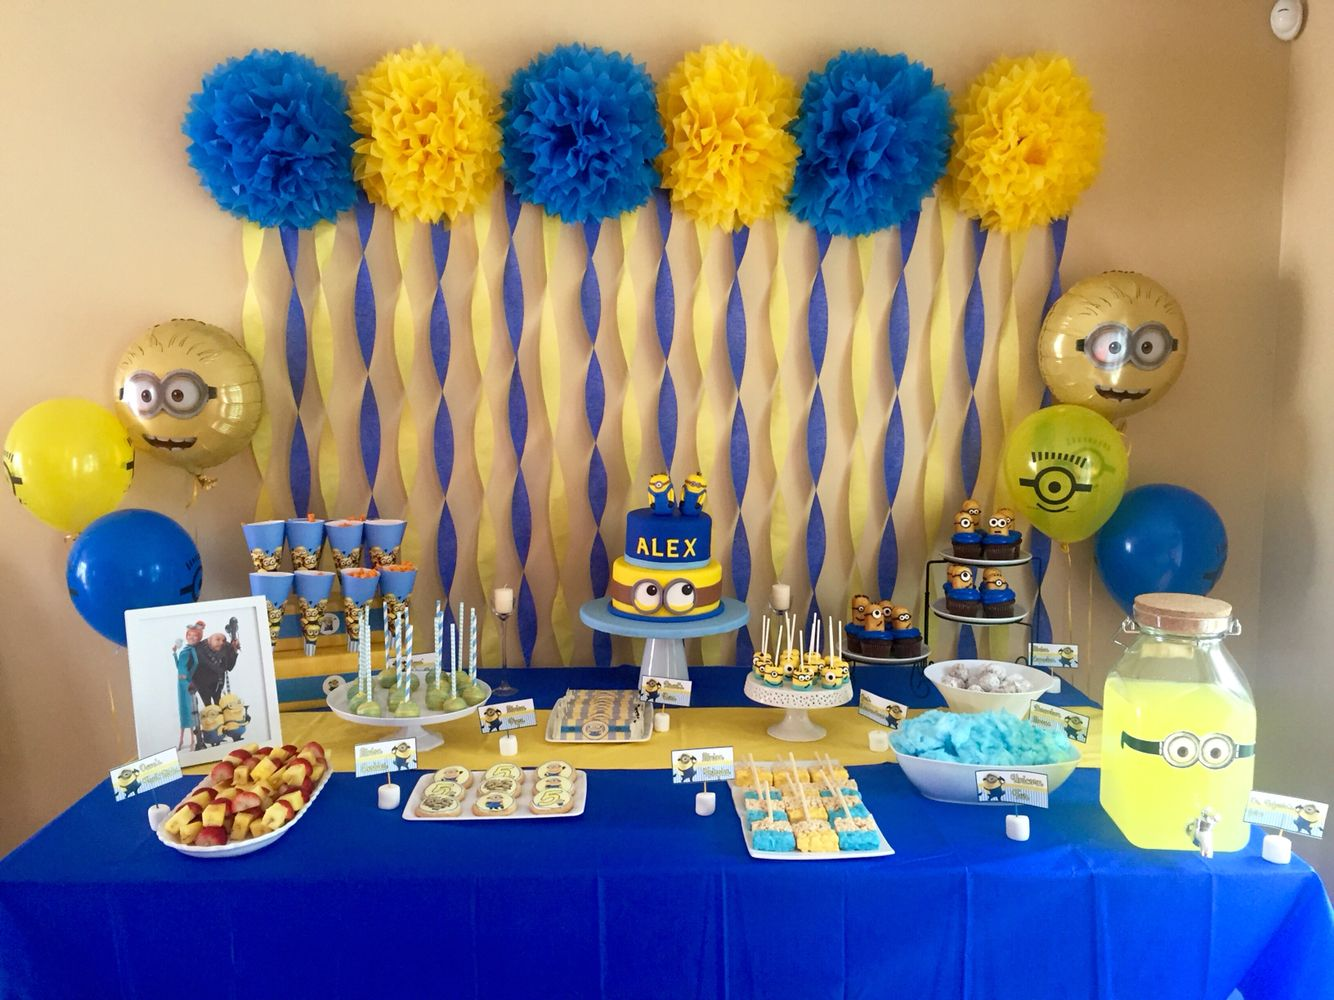 Alexs 5th minion birthday party my funnest setup yet